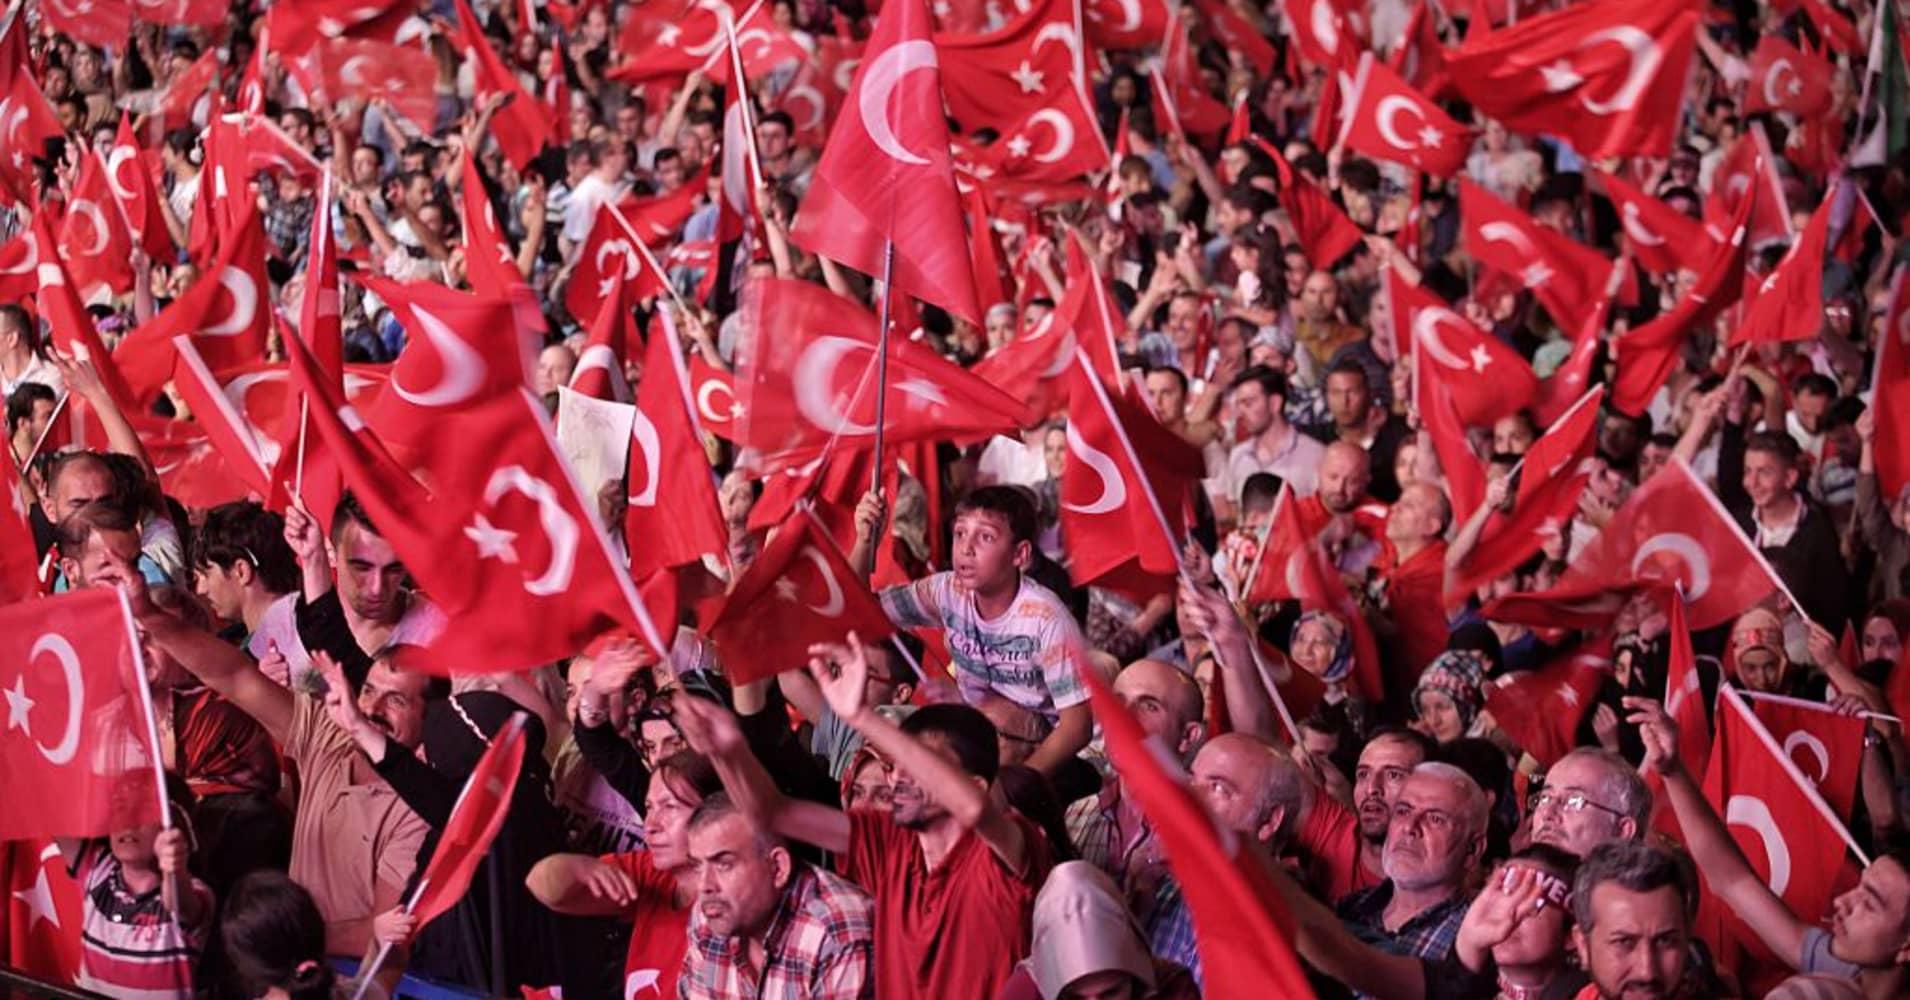 Turkey votes in historic referendum on expanding Erdogan's power